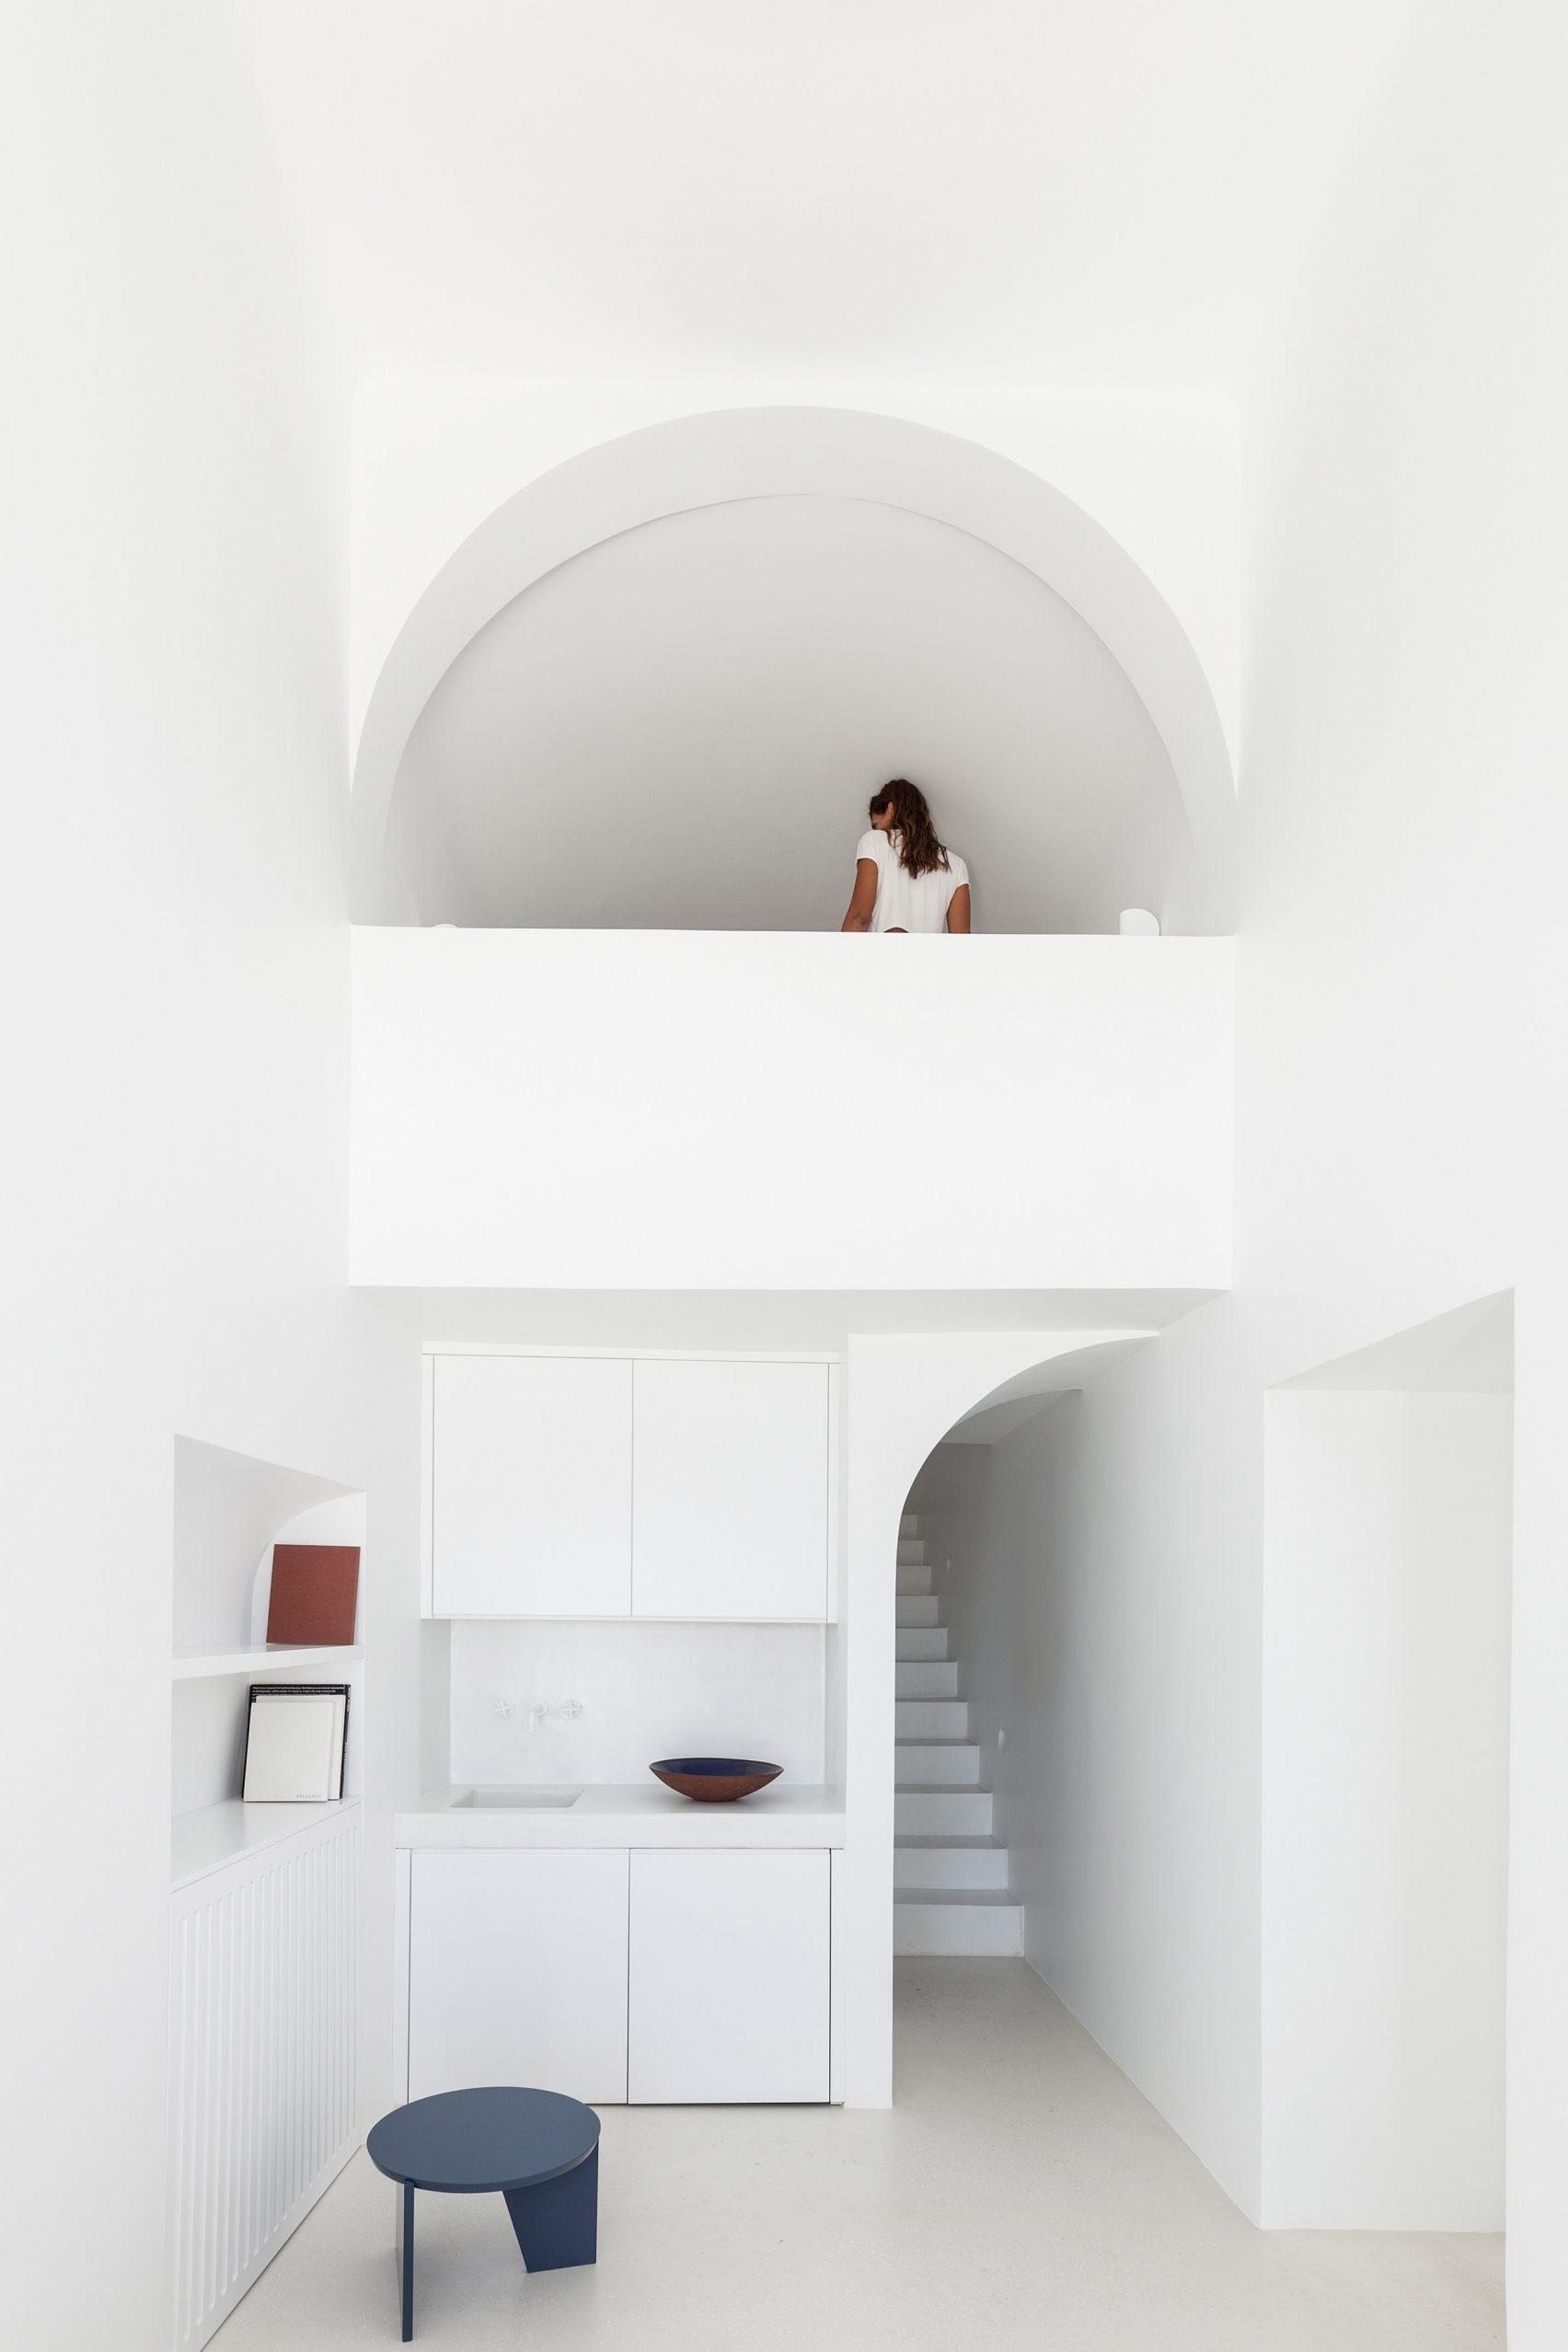 summer-residence-santorini-kapsimalis-architects-greece-architecture_dezeen_2364_col_19-1704x2556